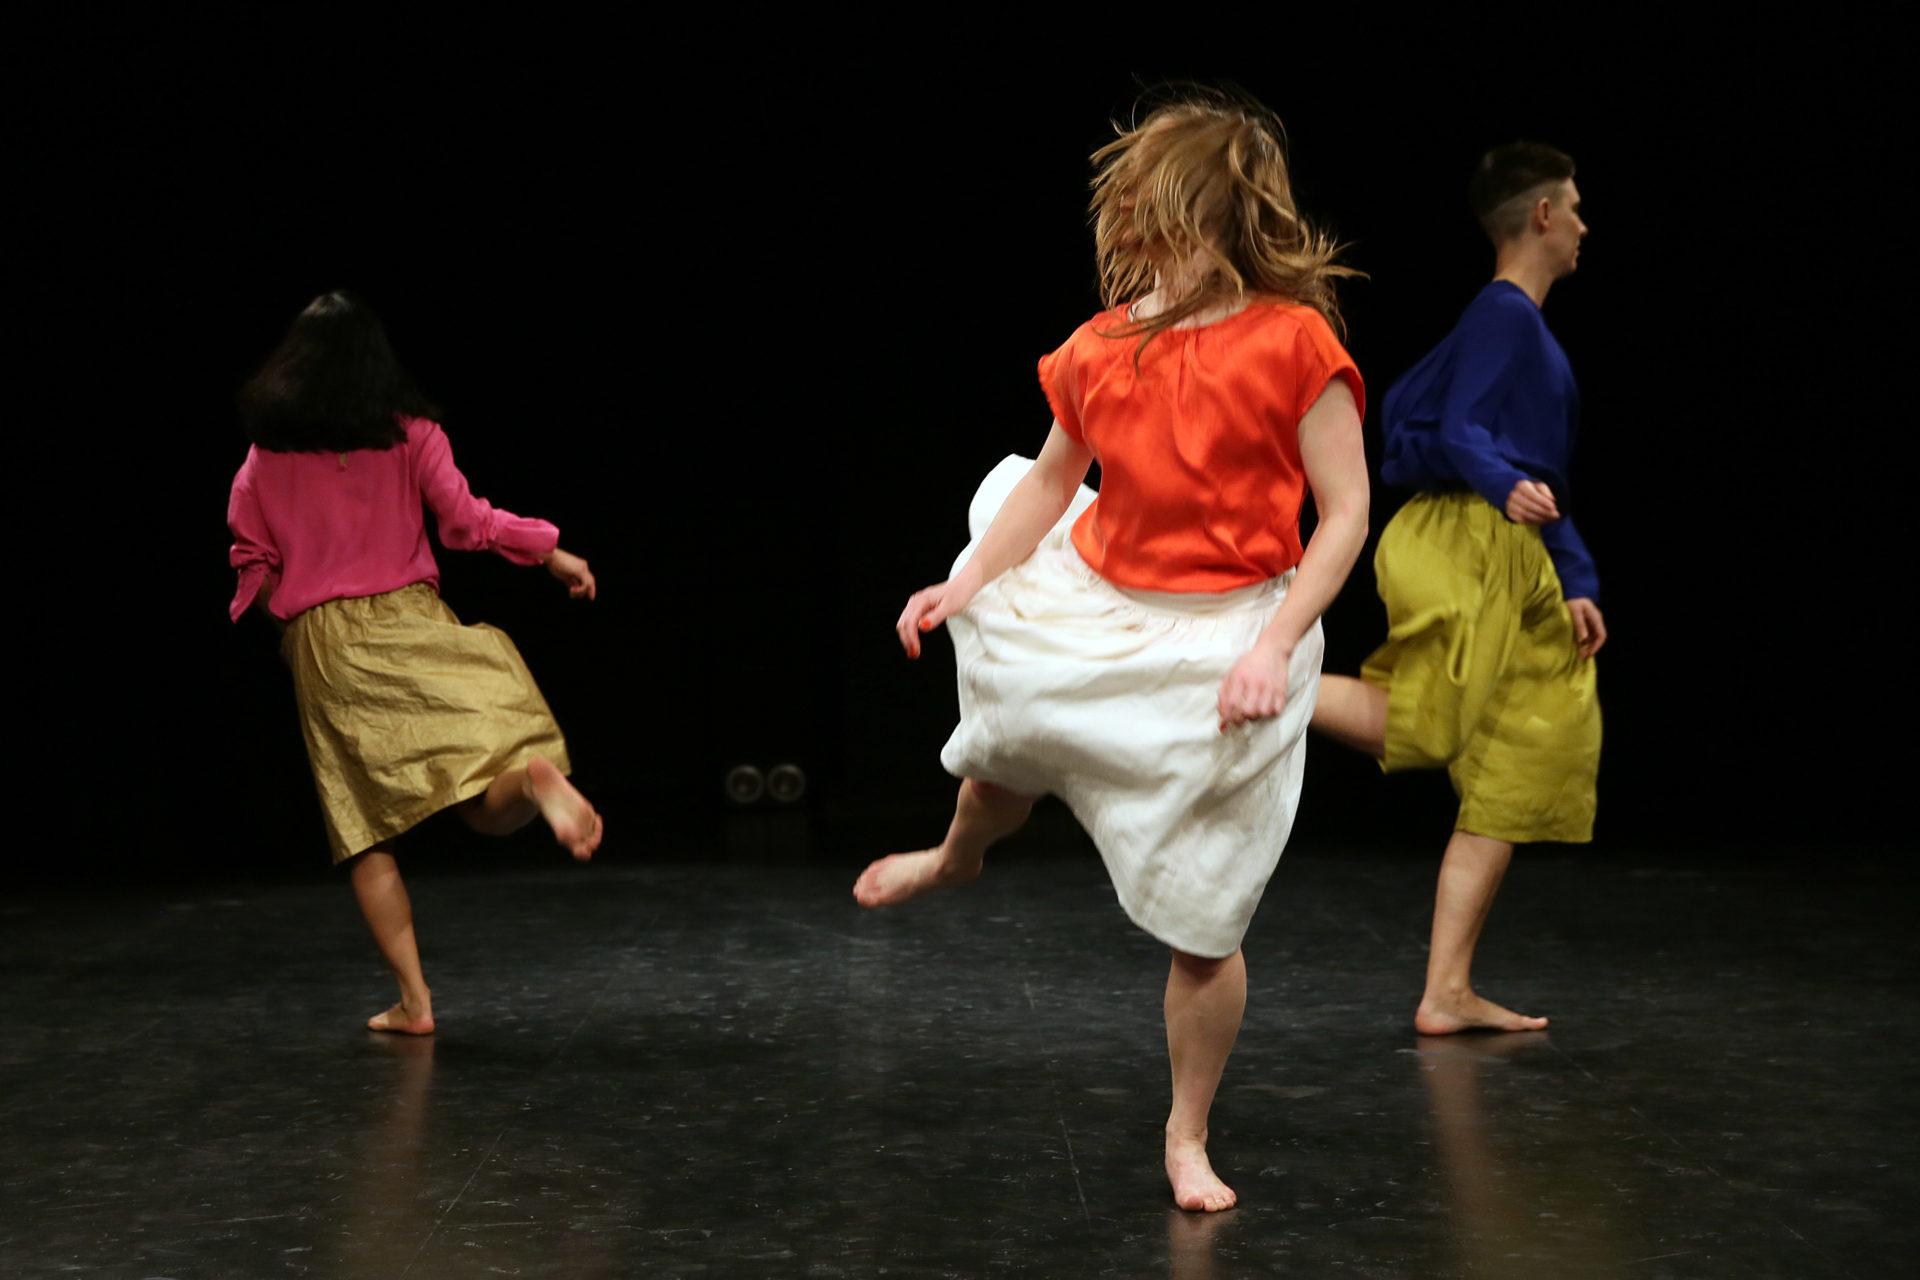 Dance_Forever_Fernanda_Ortiz_AnjaBeutler.de_146